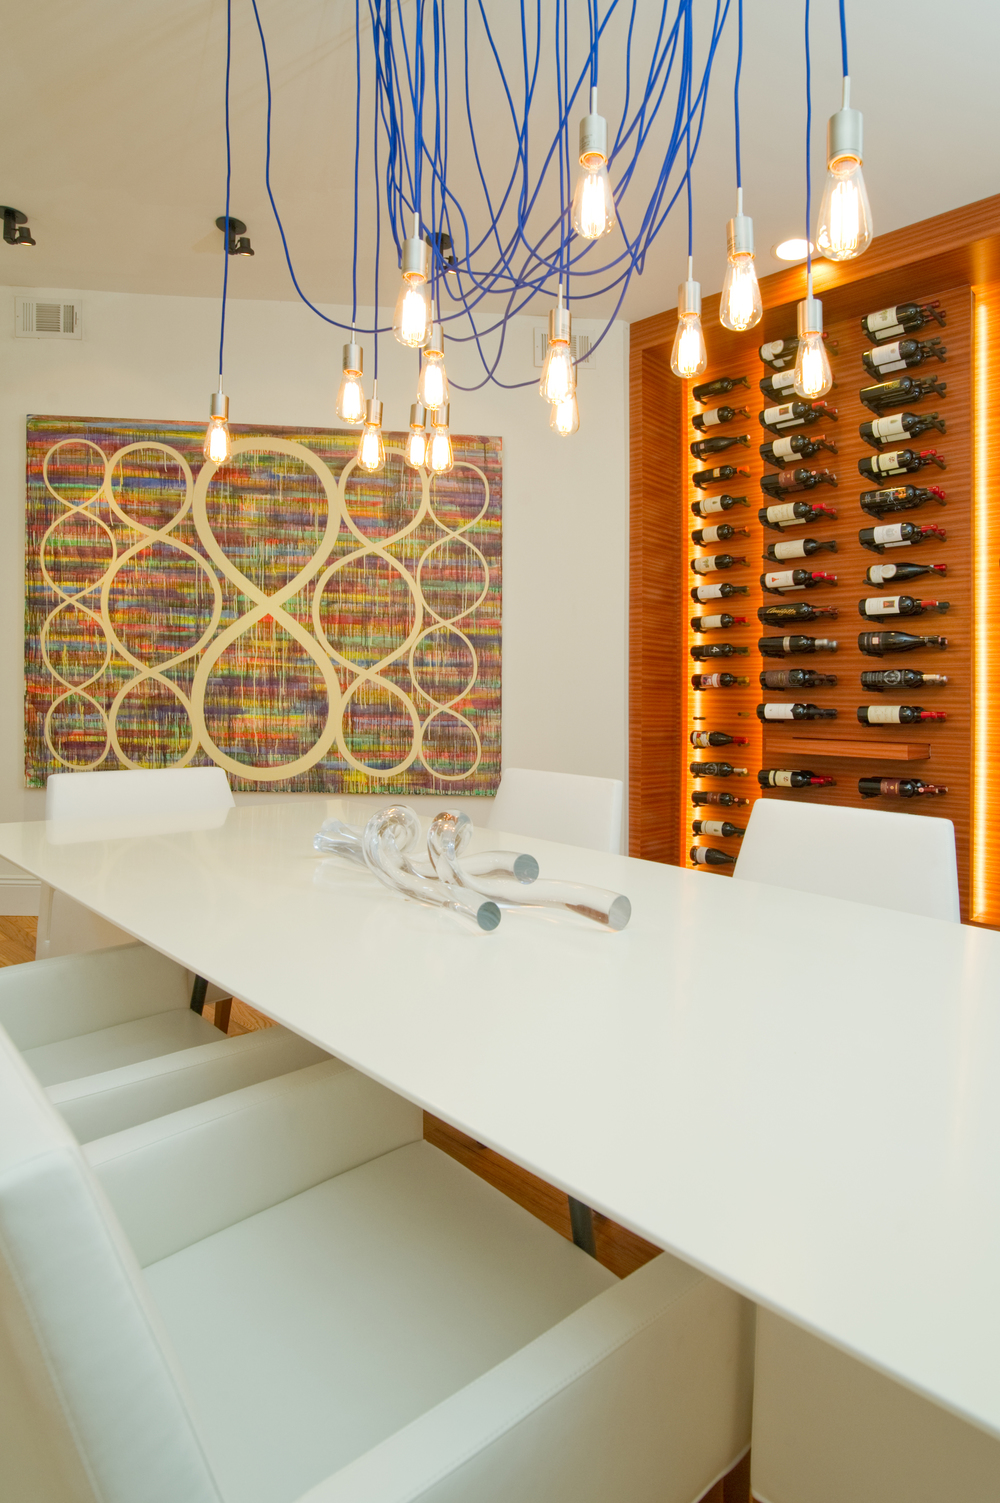 O Street NW15 - Dining Room with Art.jpg